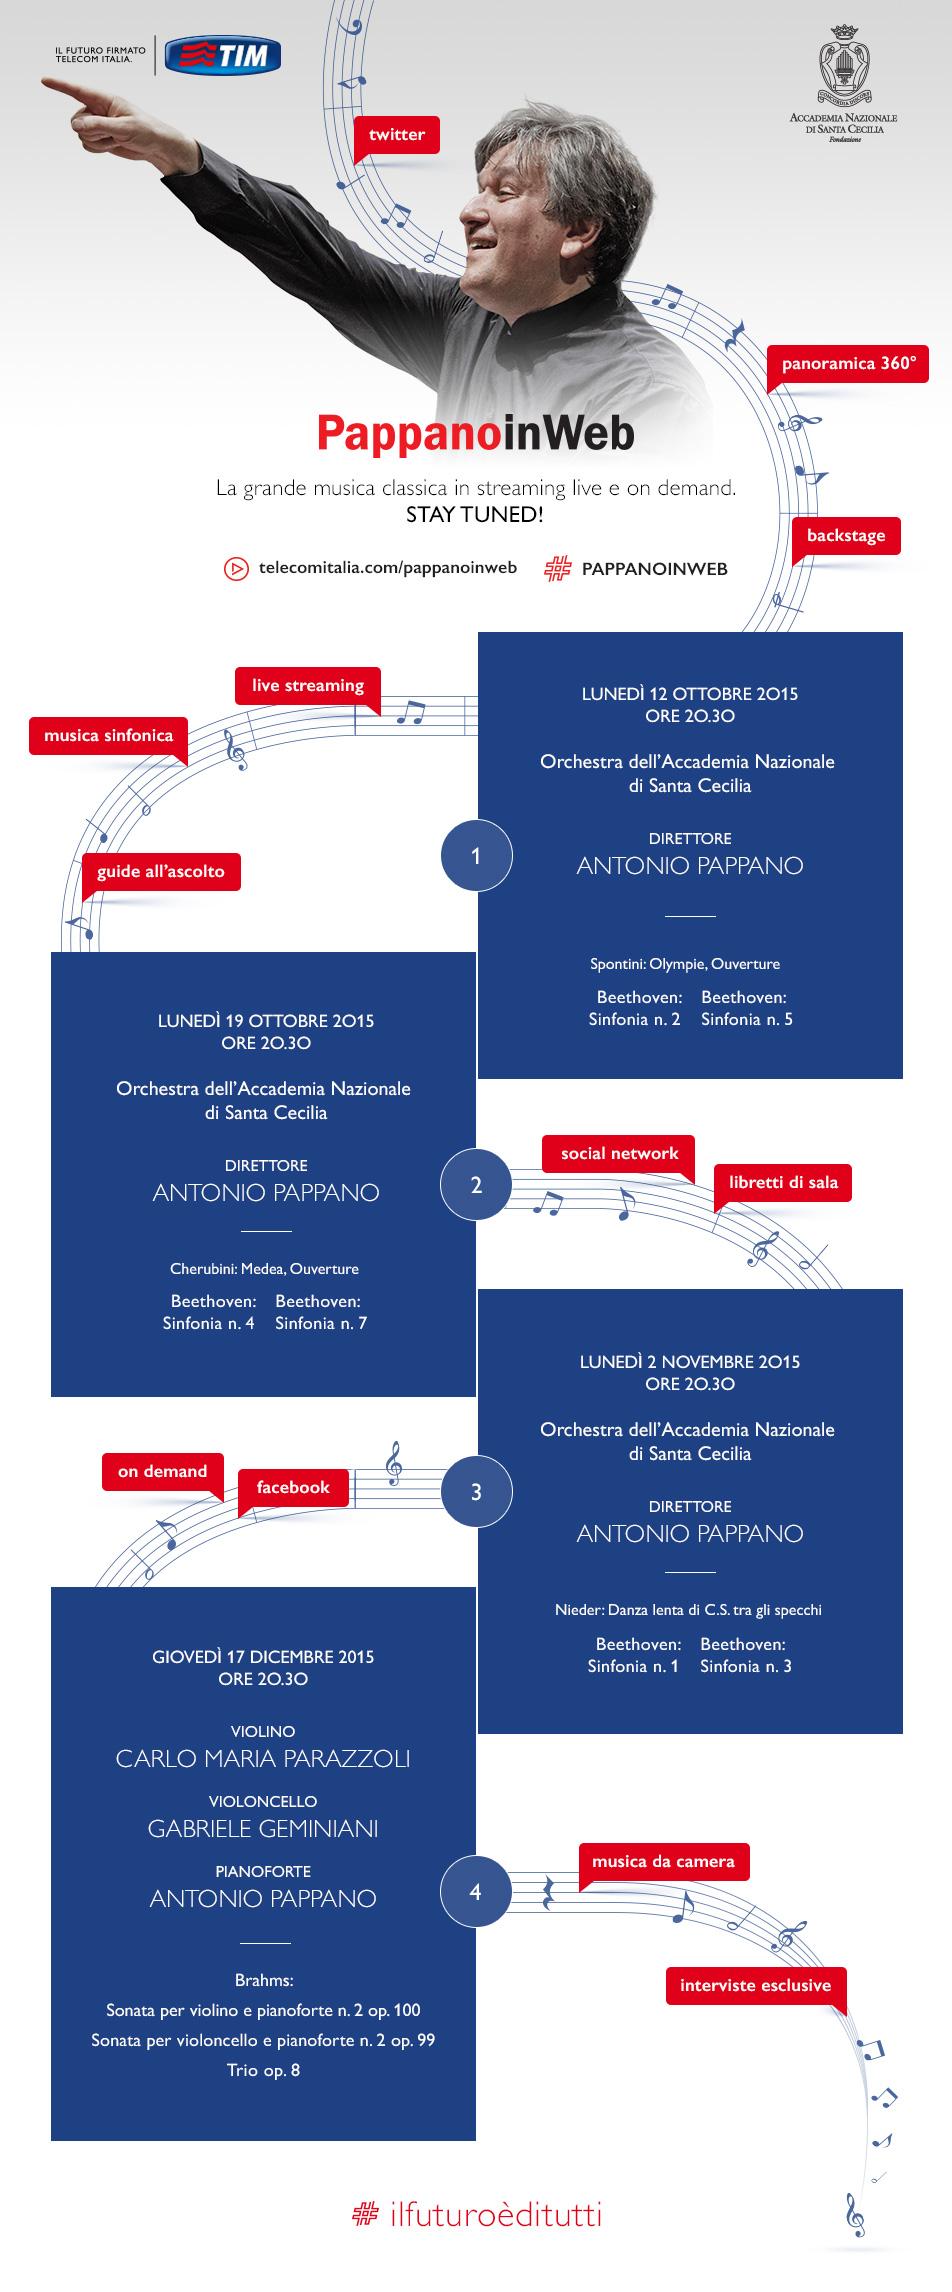 infografica-programma-pappanoinweb-2015-web-ITA